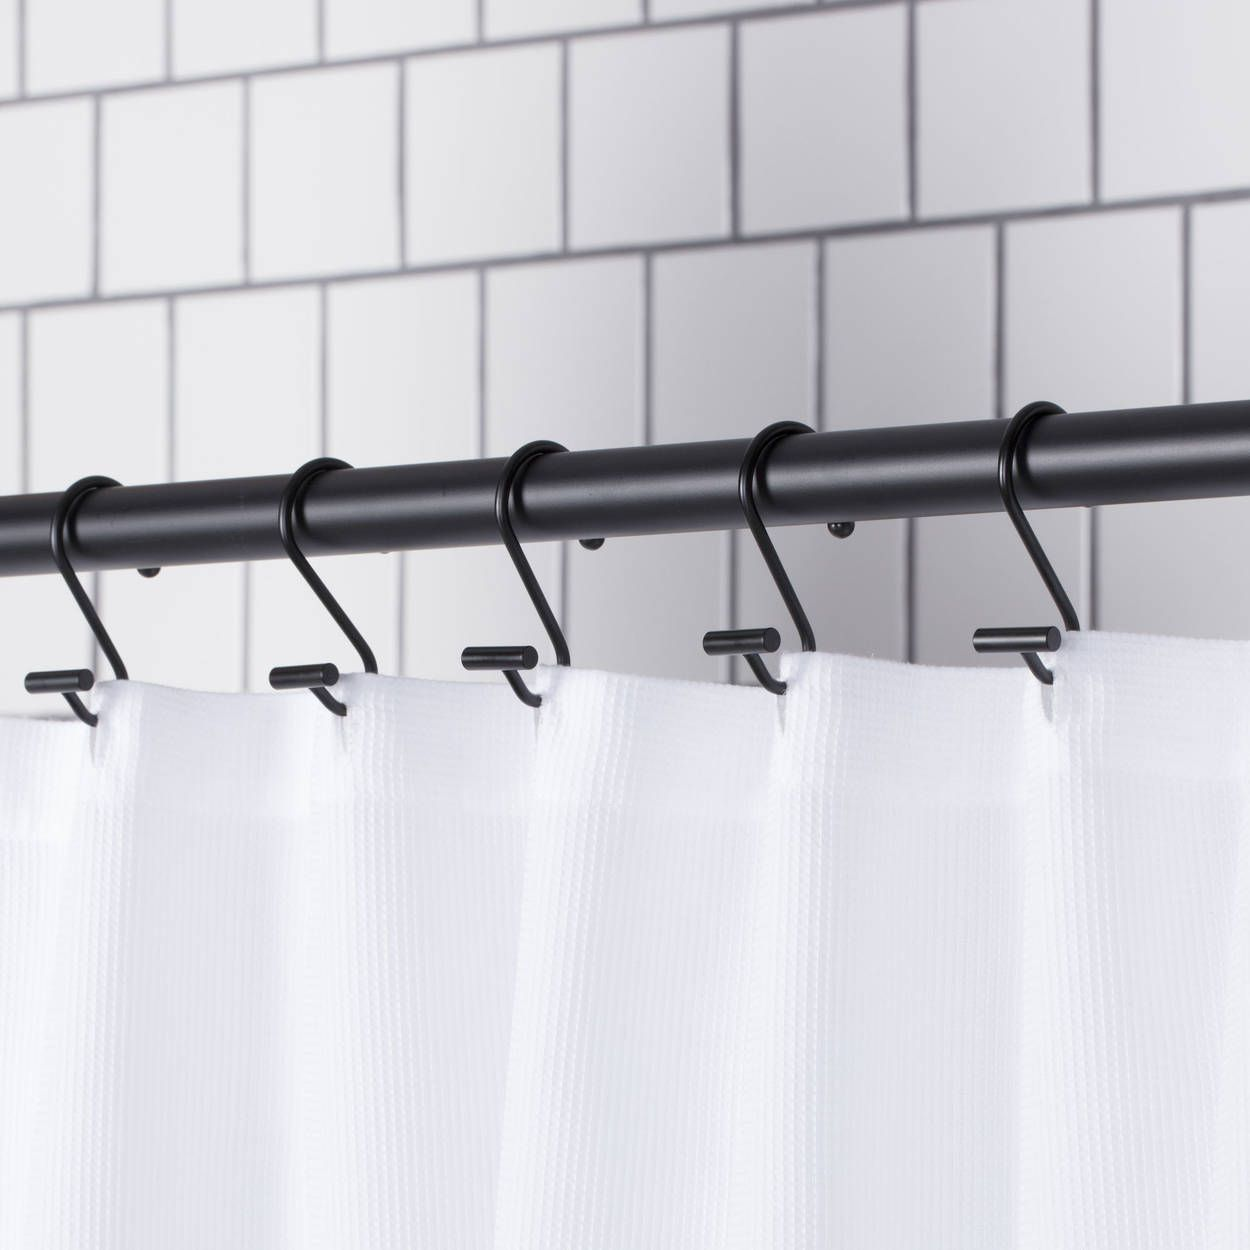 Set Of 12 Shower Curtain Hooks Modern Shower Curtains Black